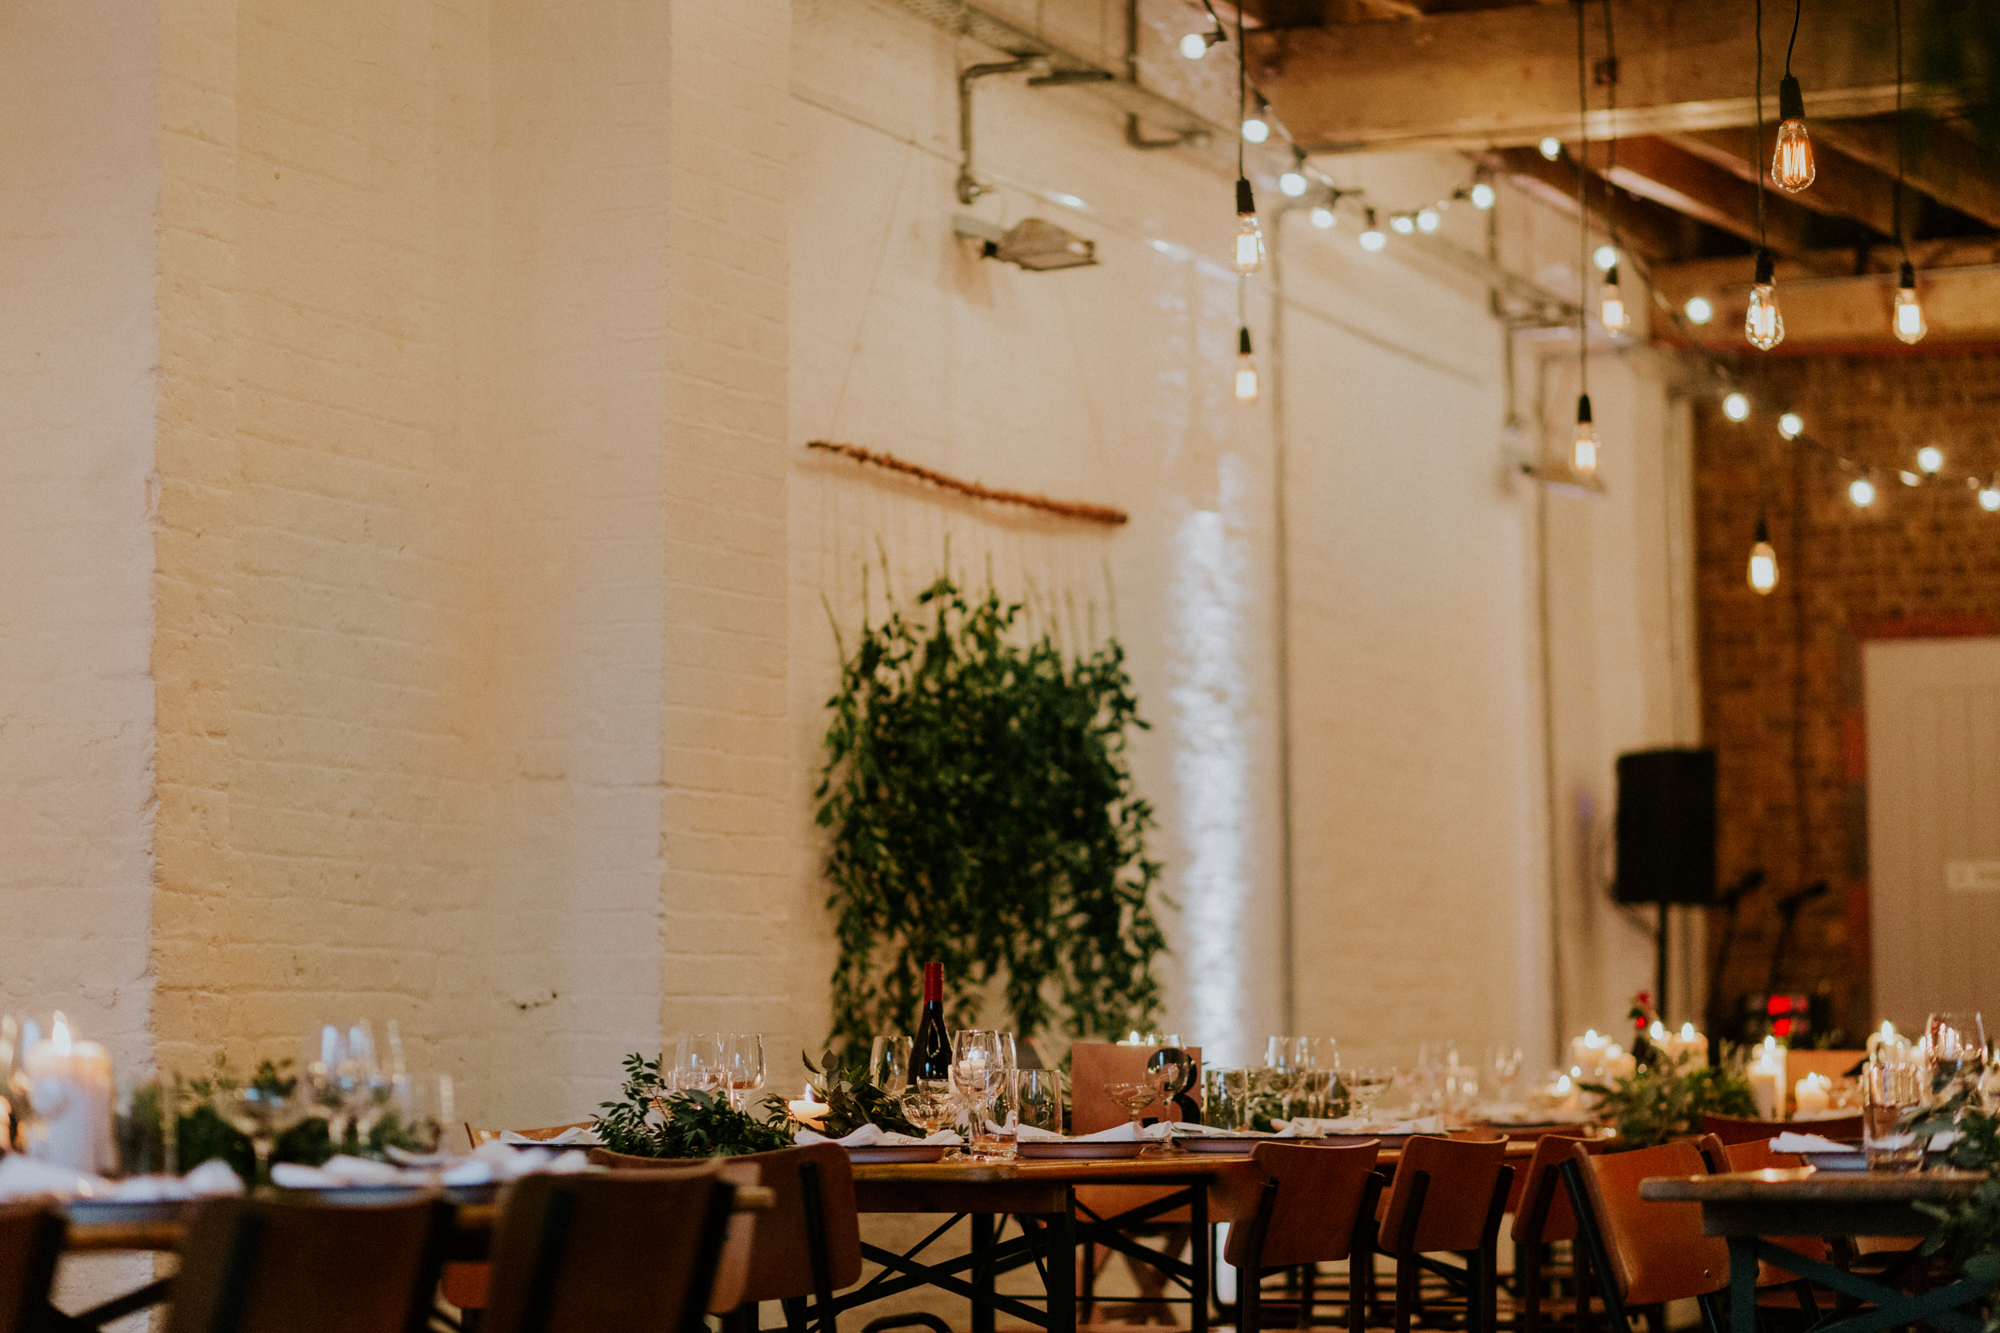 Quirky Venue, Non-traditional wedding planner, dry-hirevenue, London Wedding coordination, Event Bar, Bespoke weddings, Event team, Brixton East 1871 Wedding, Streetfood wedding, informal, Stylish,